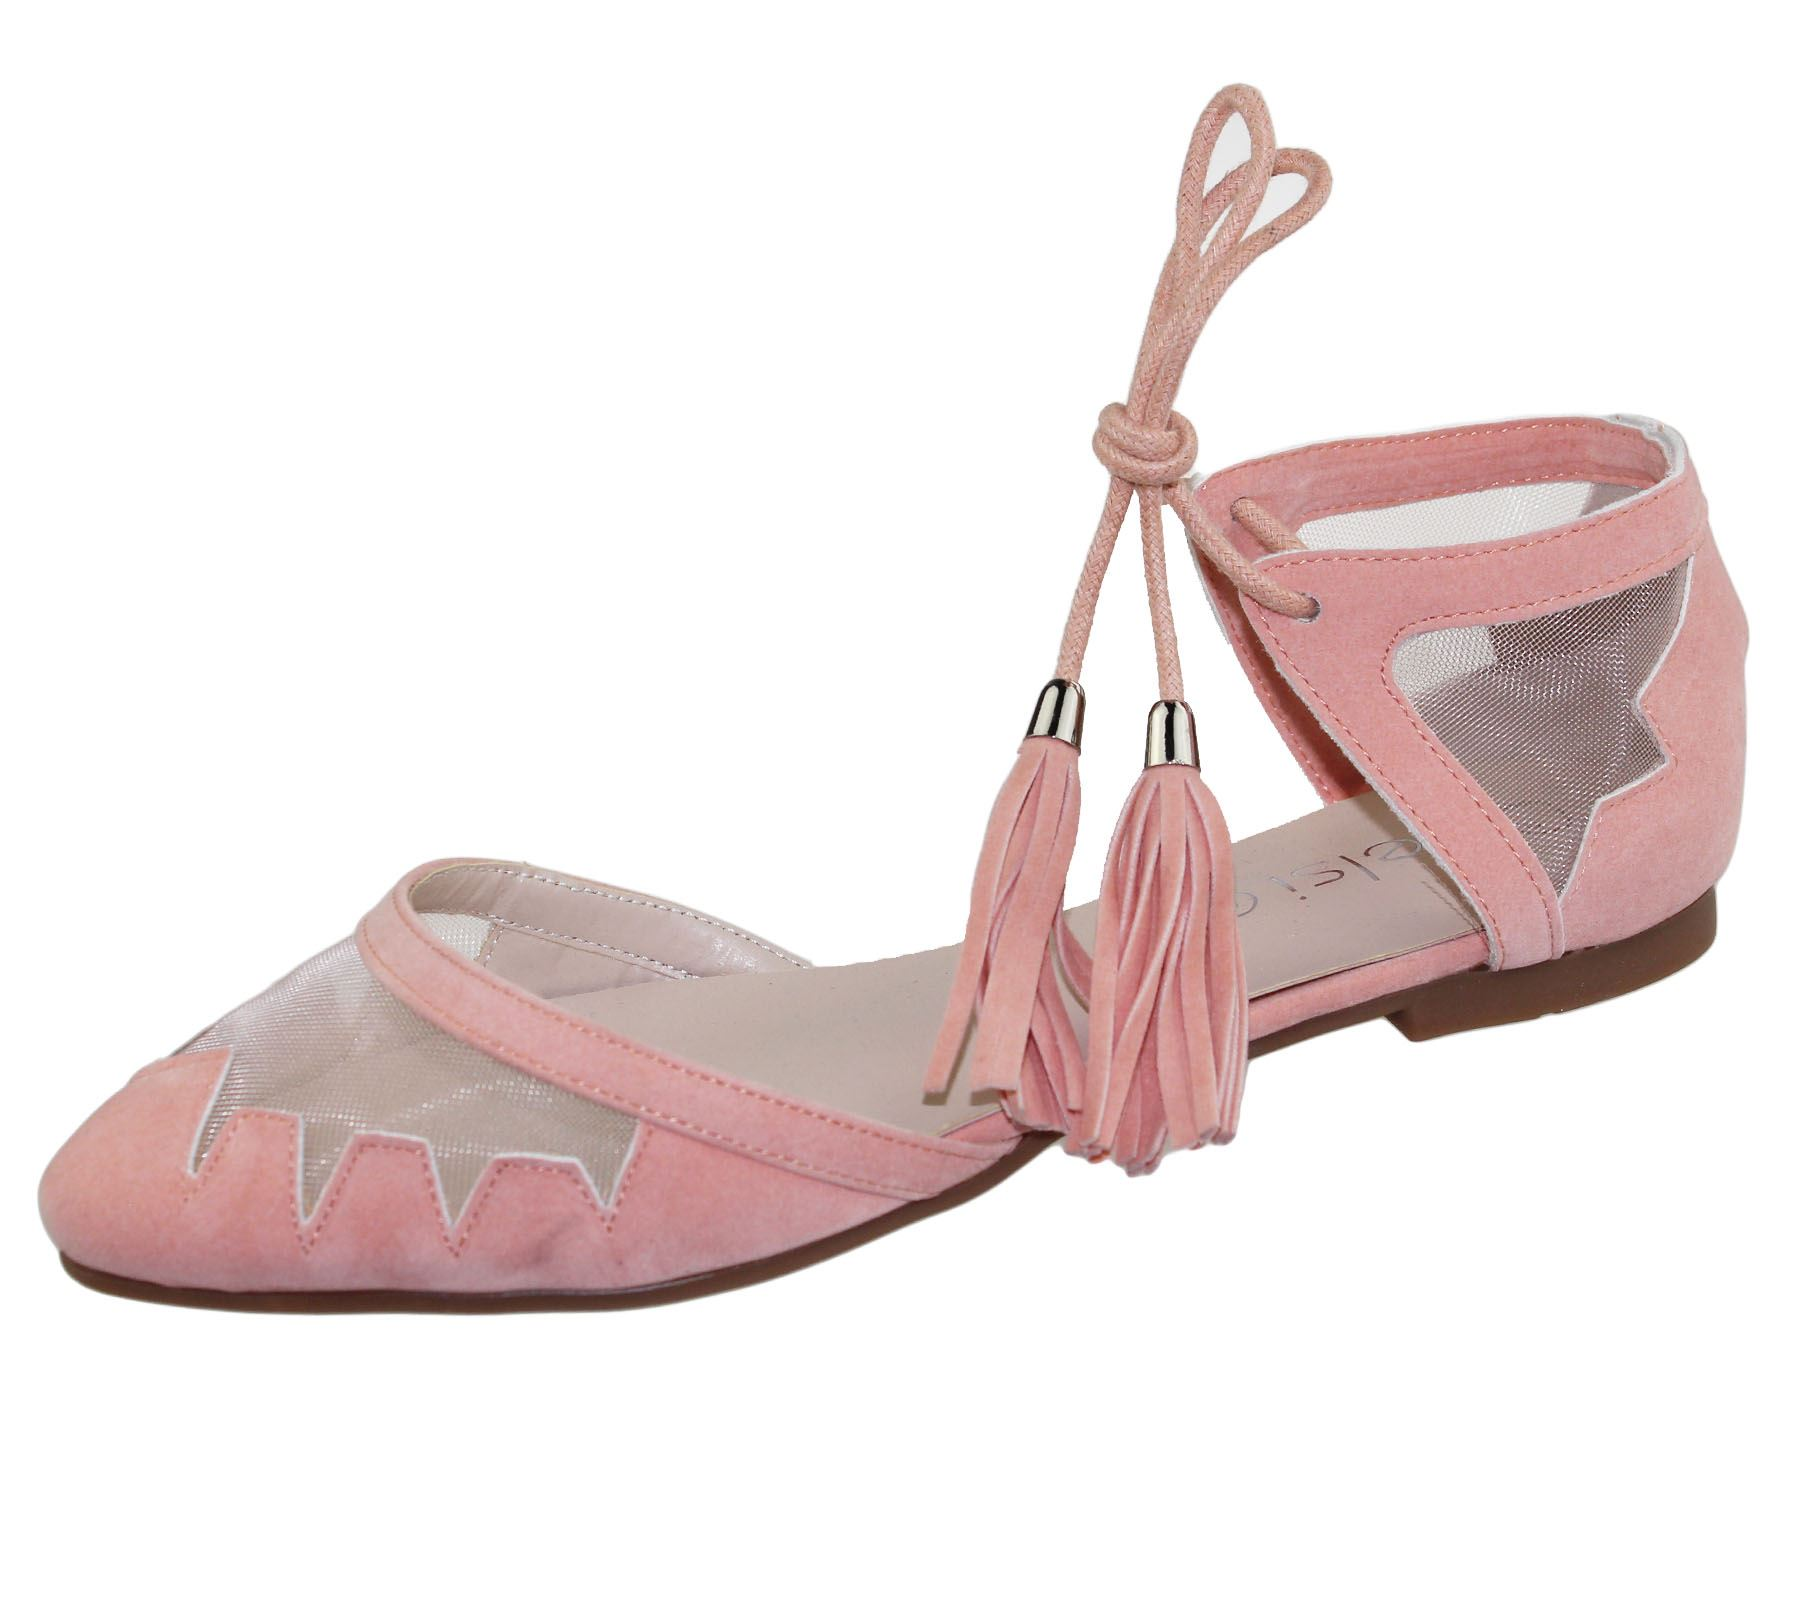 Womens-Flat-Ballerina-Dolly-Pumps-Ballet-Ladies-Summer-Mesh-Tassel-Shoes-Sandals thumbnail 30